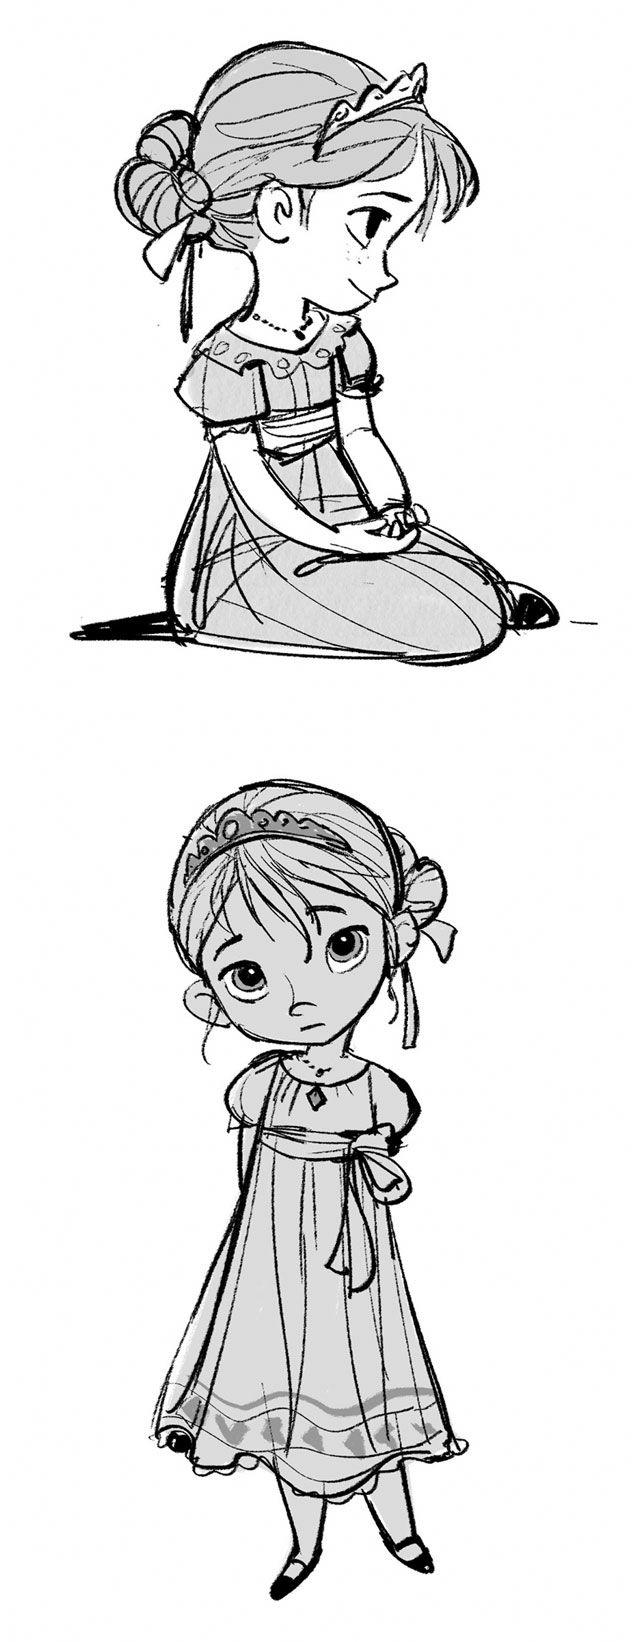 http://theconceptartblog.com/wp-content/uploads/2013/12/JinKim_Frozen_2.jpg